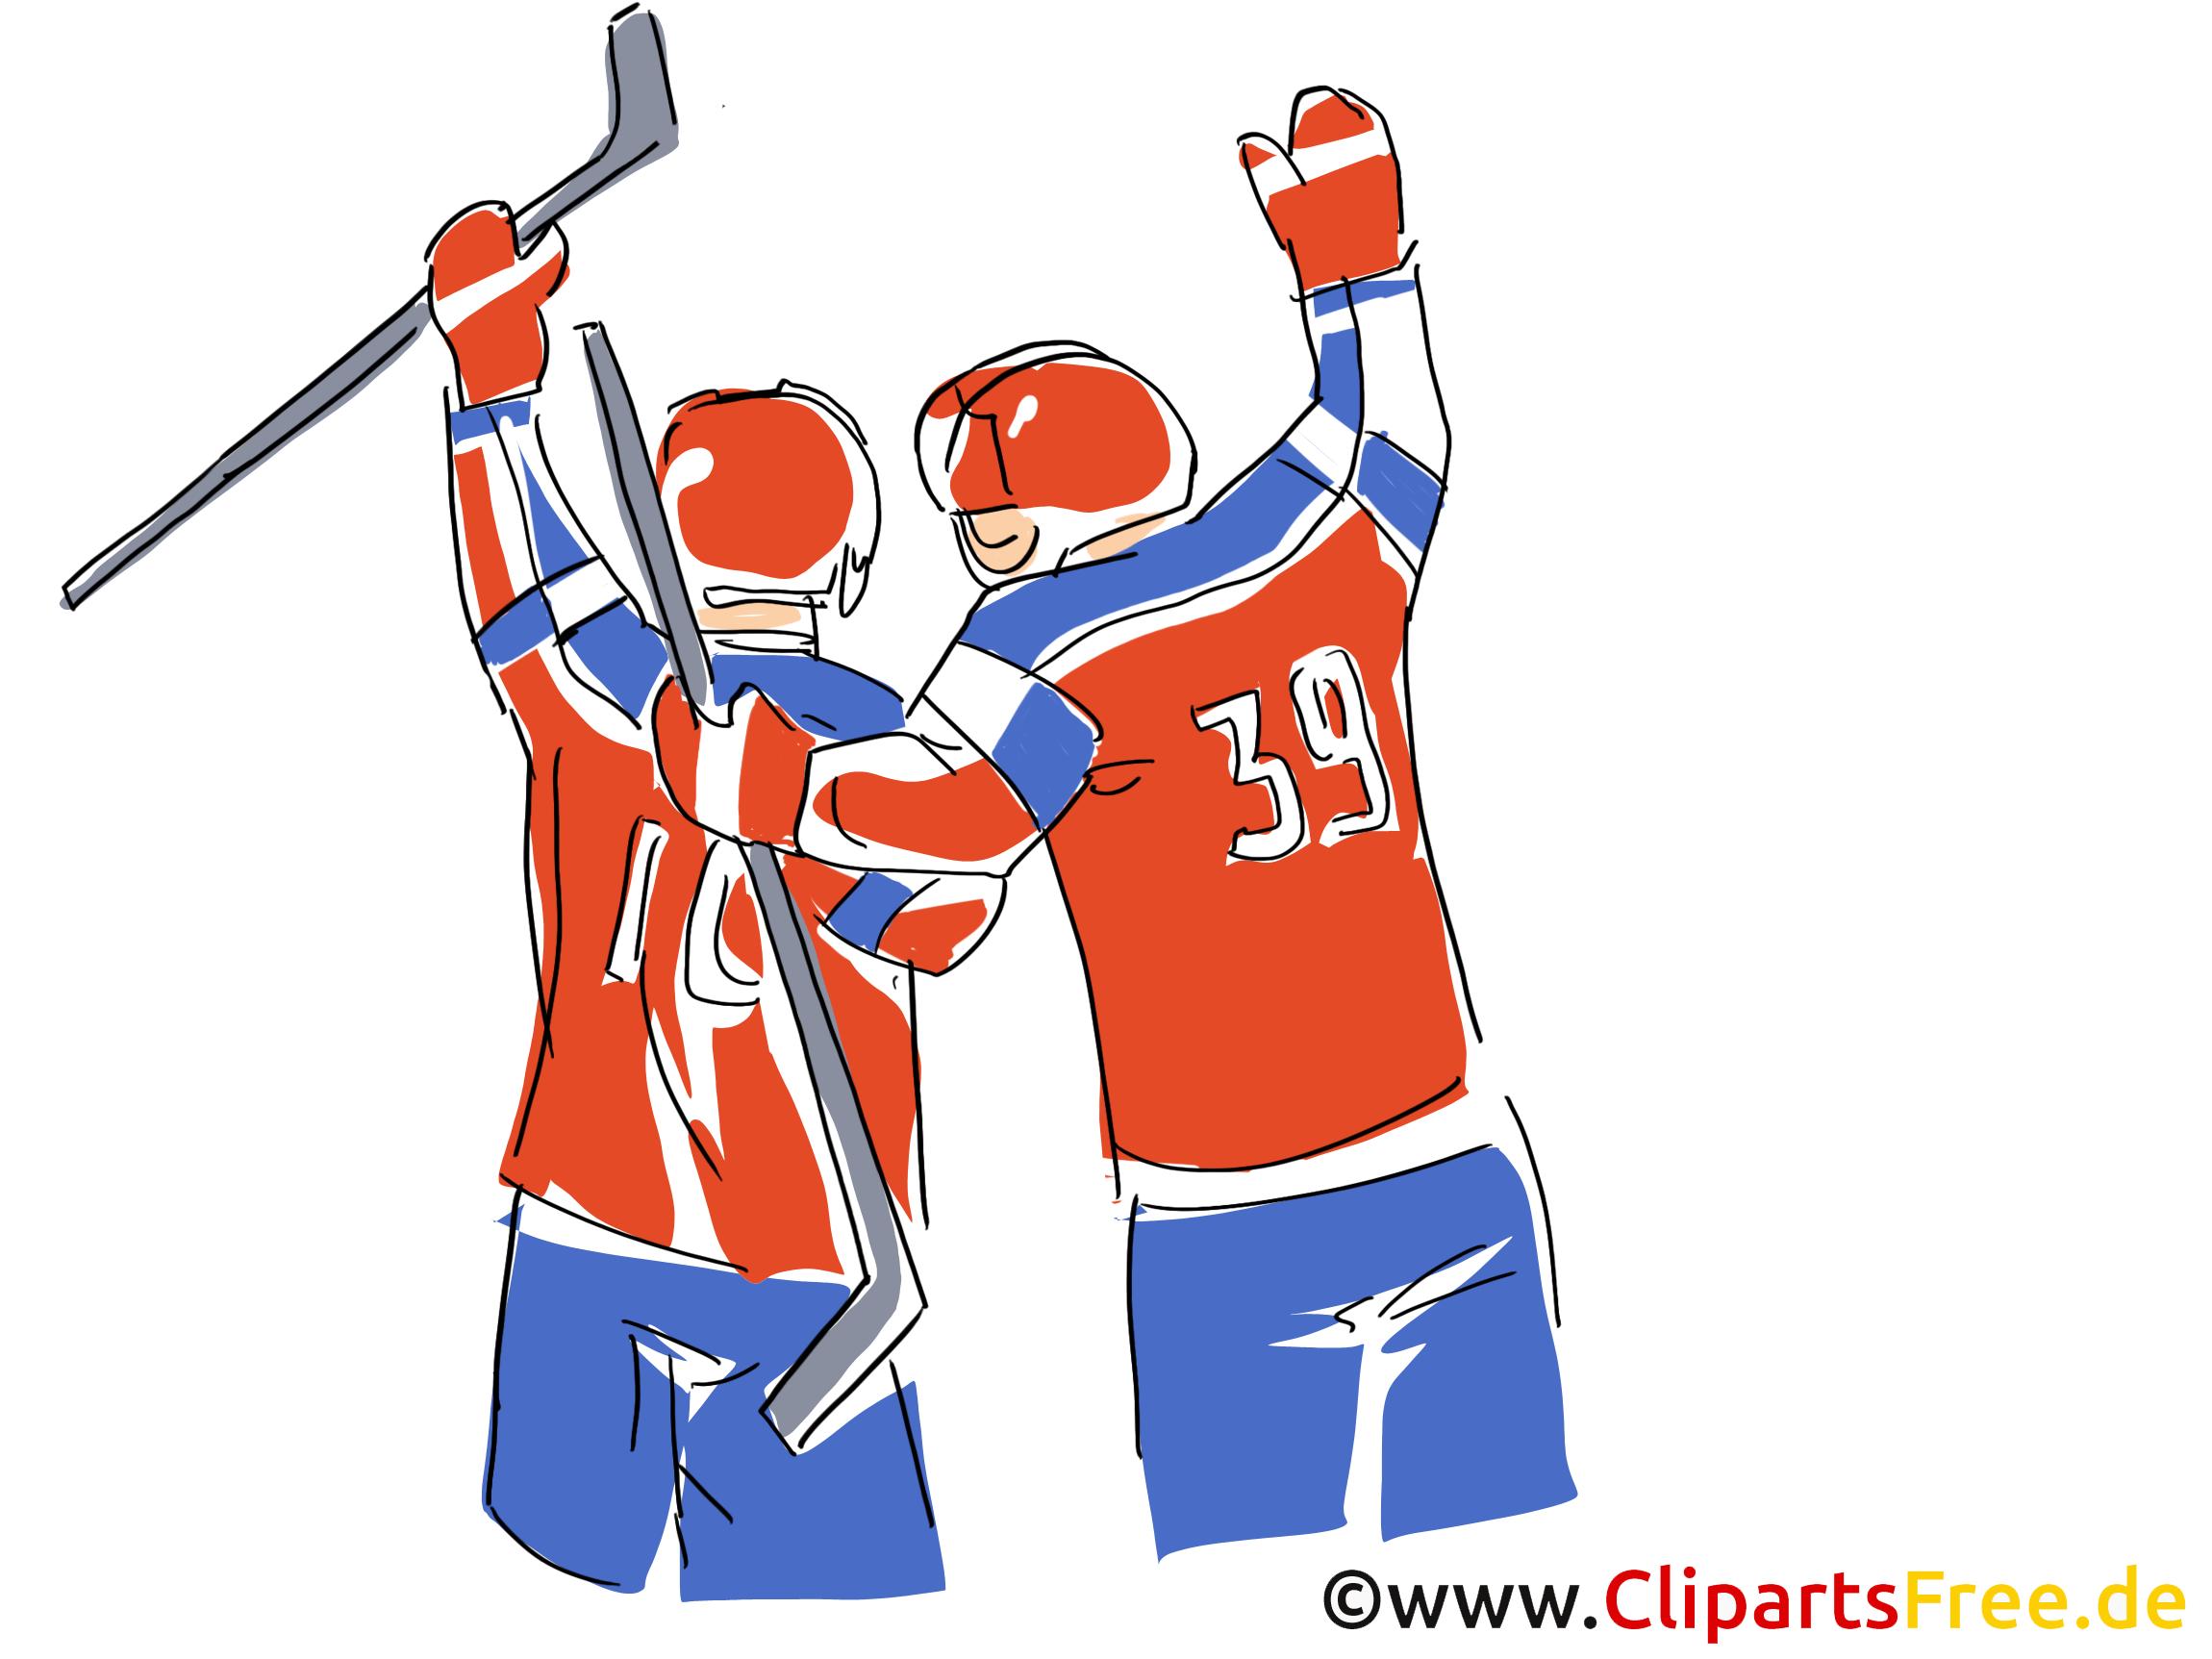 Victoire image gratuite - Hockey illustration